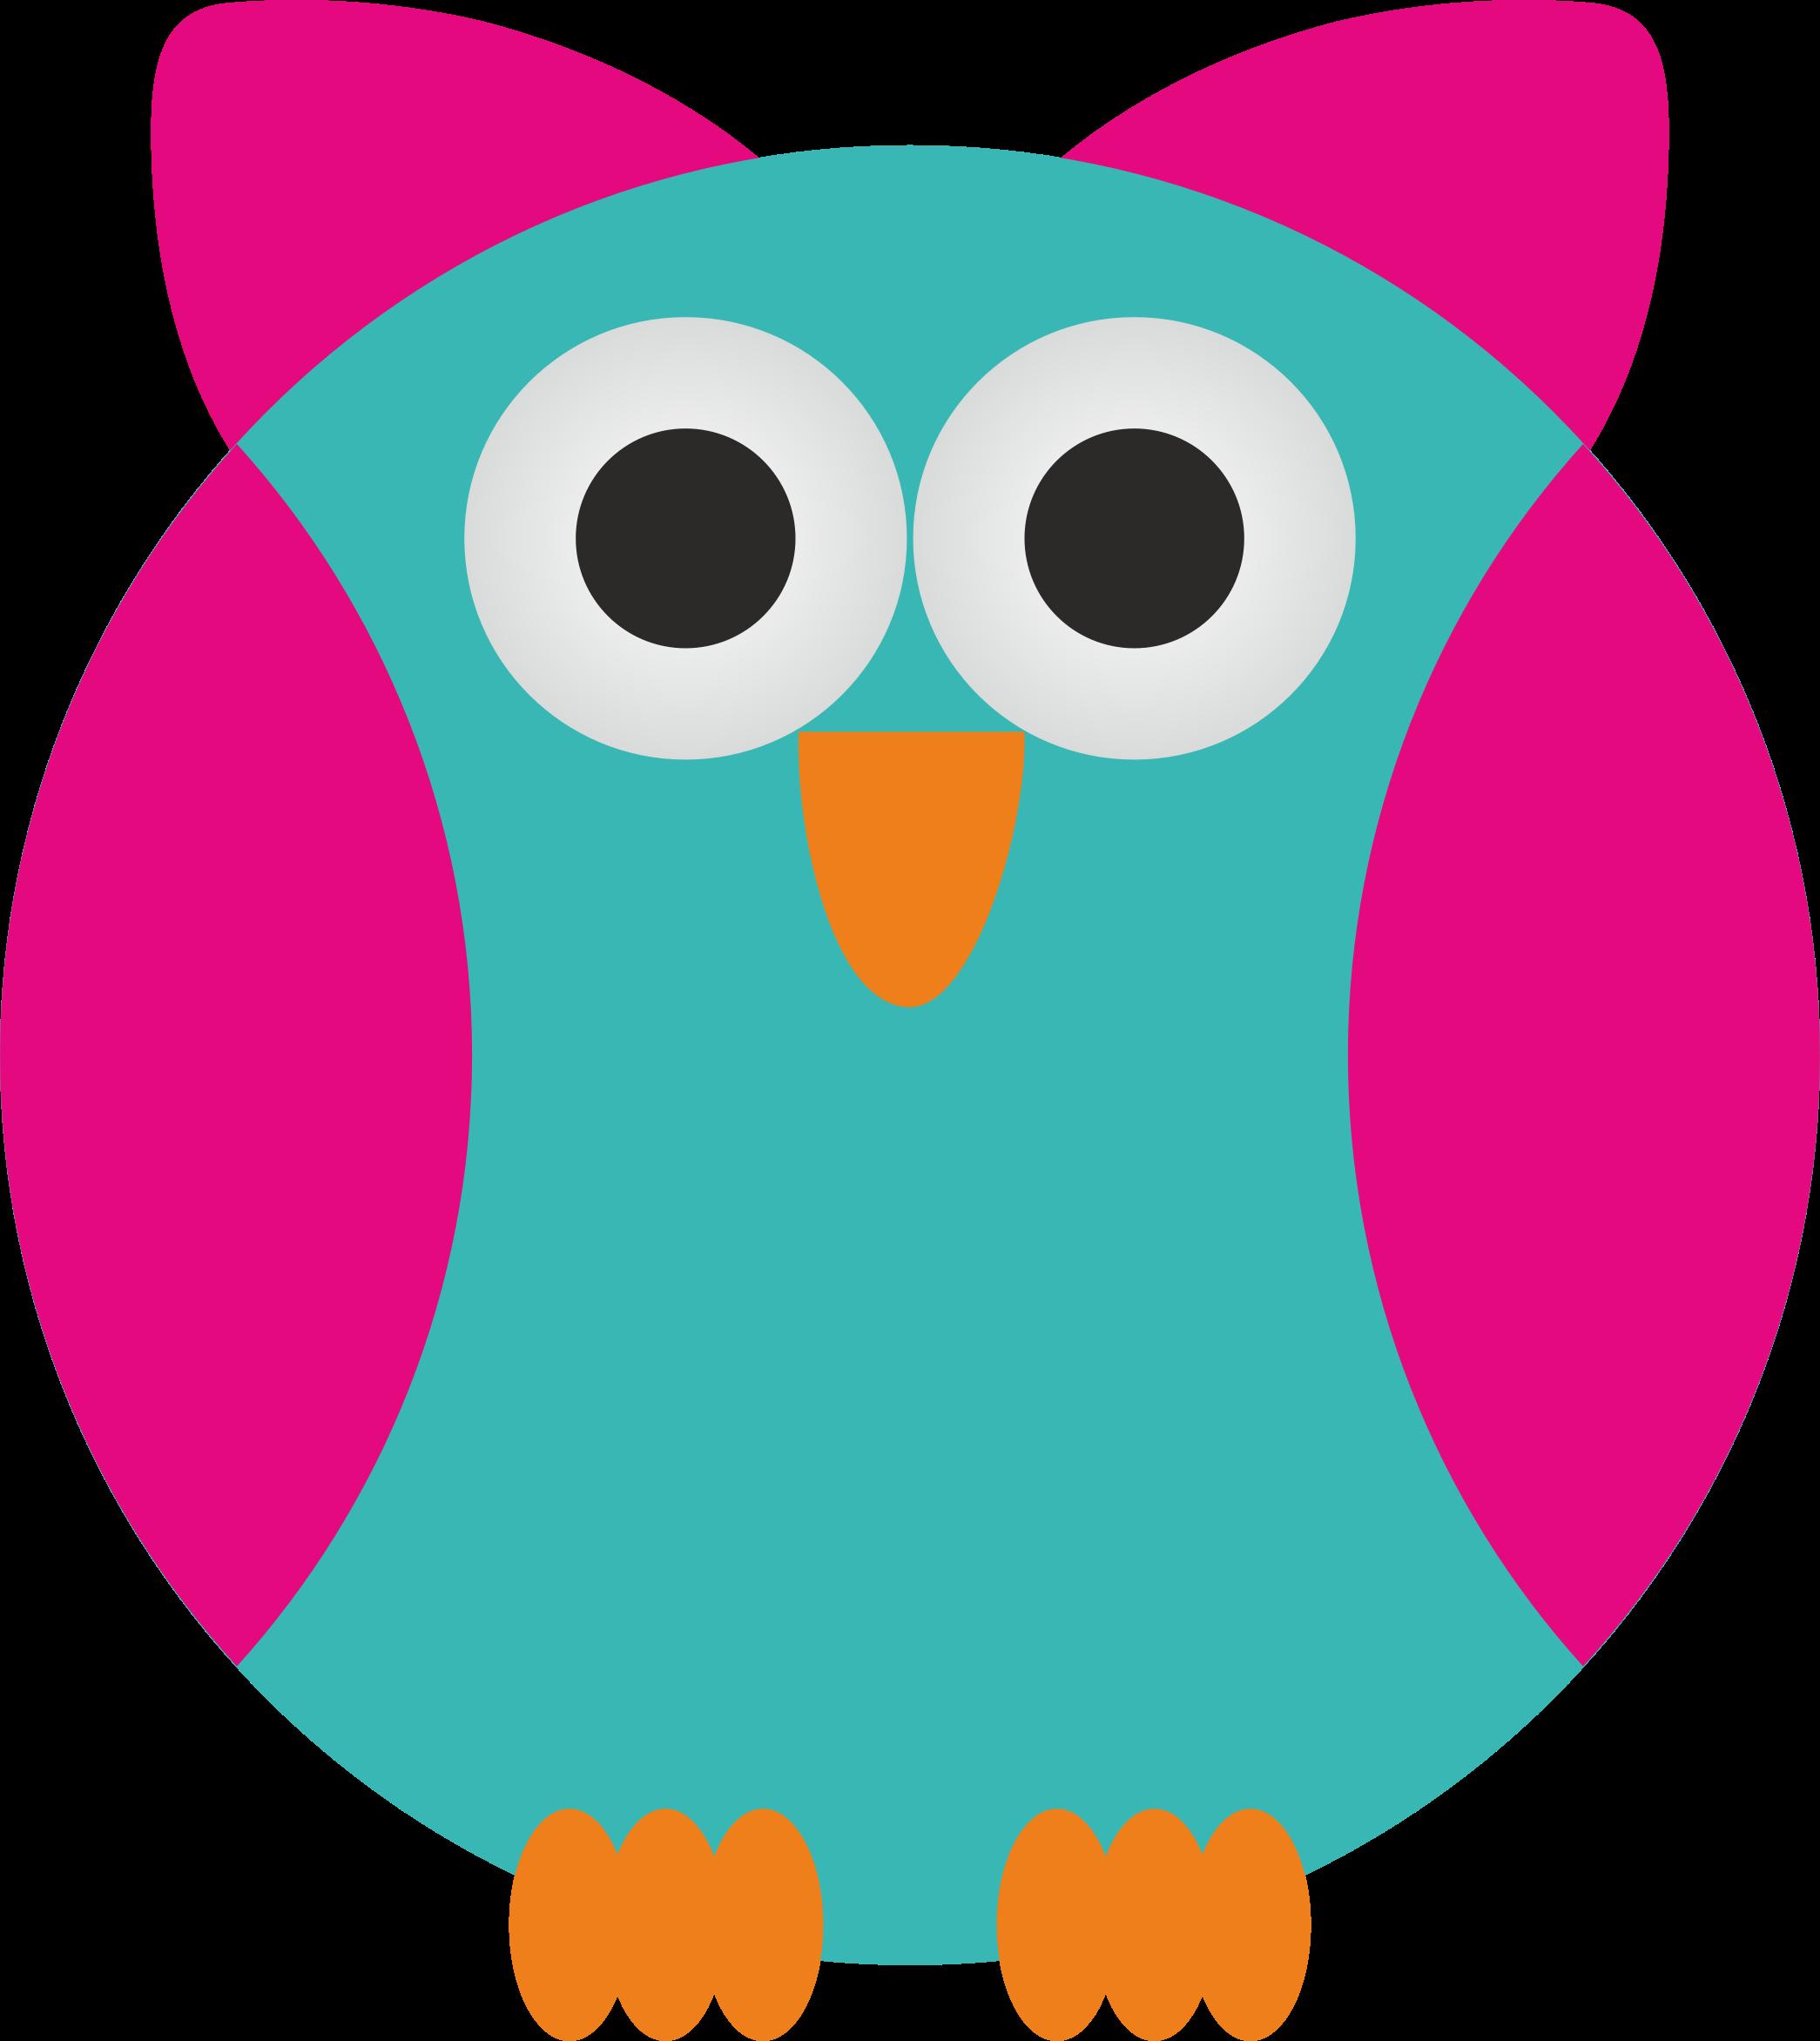 Clipart - Simple Owl